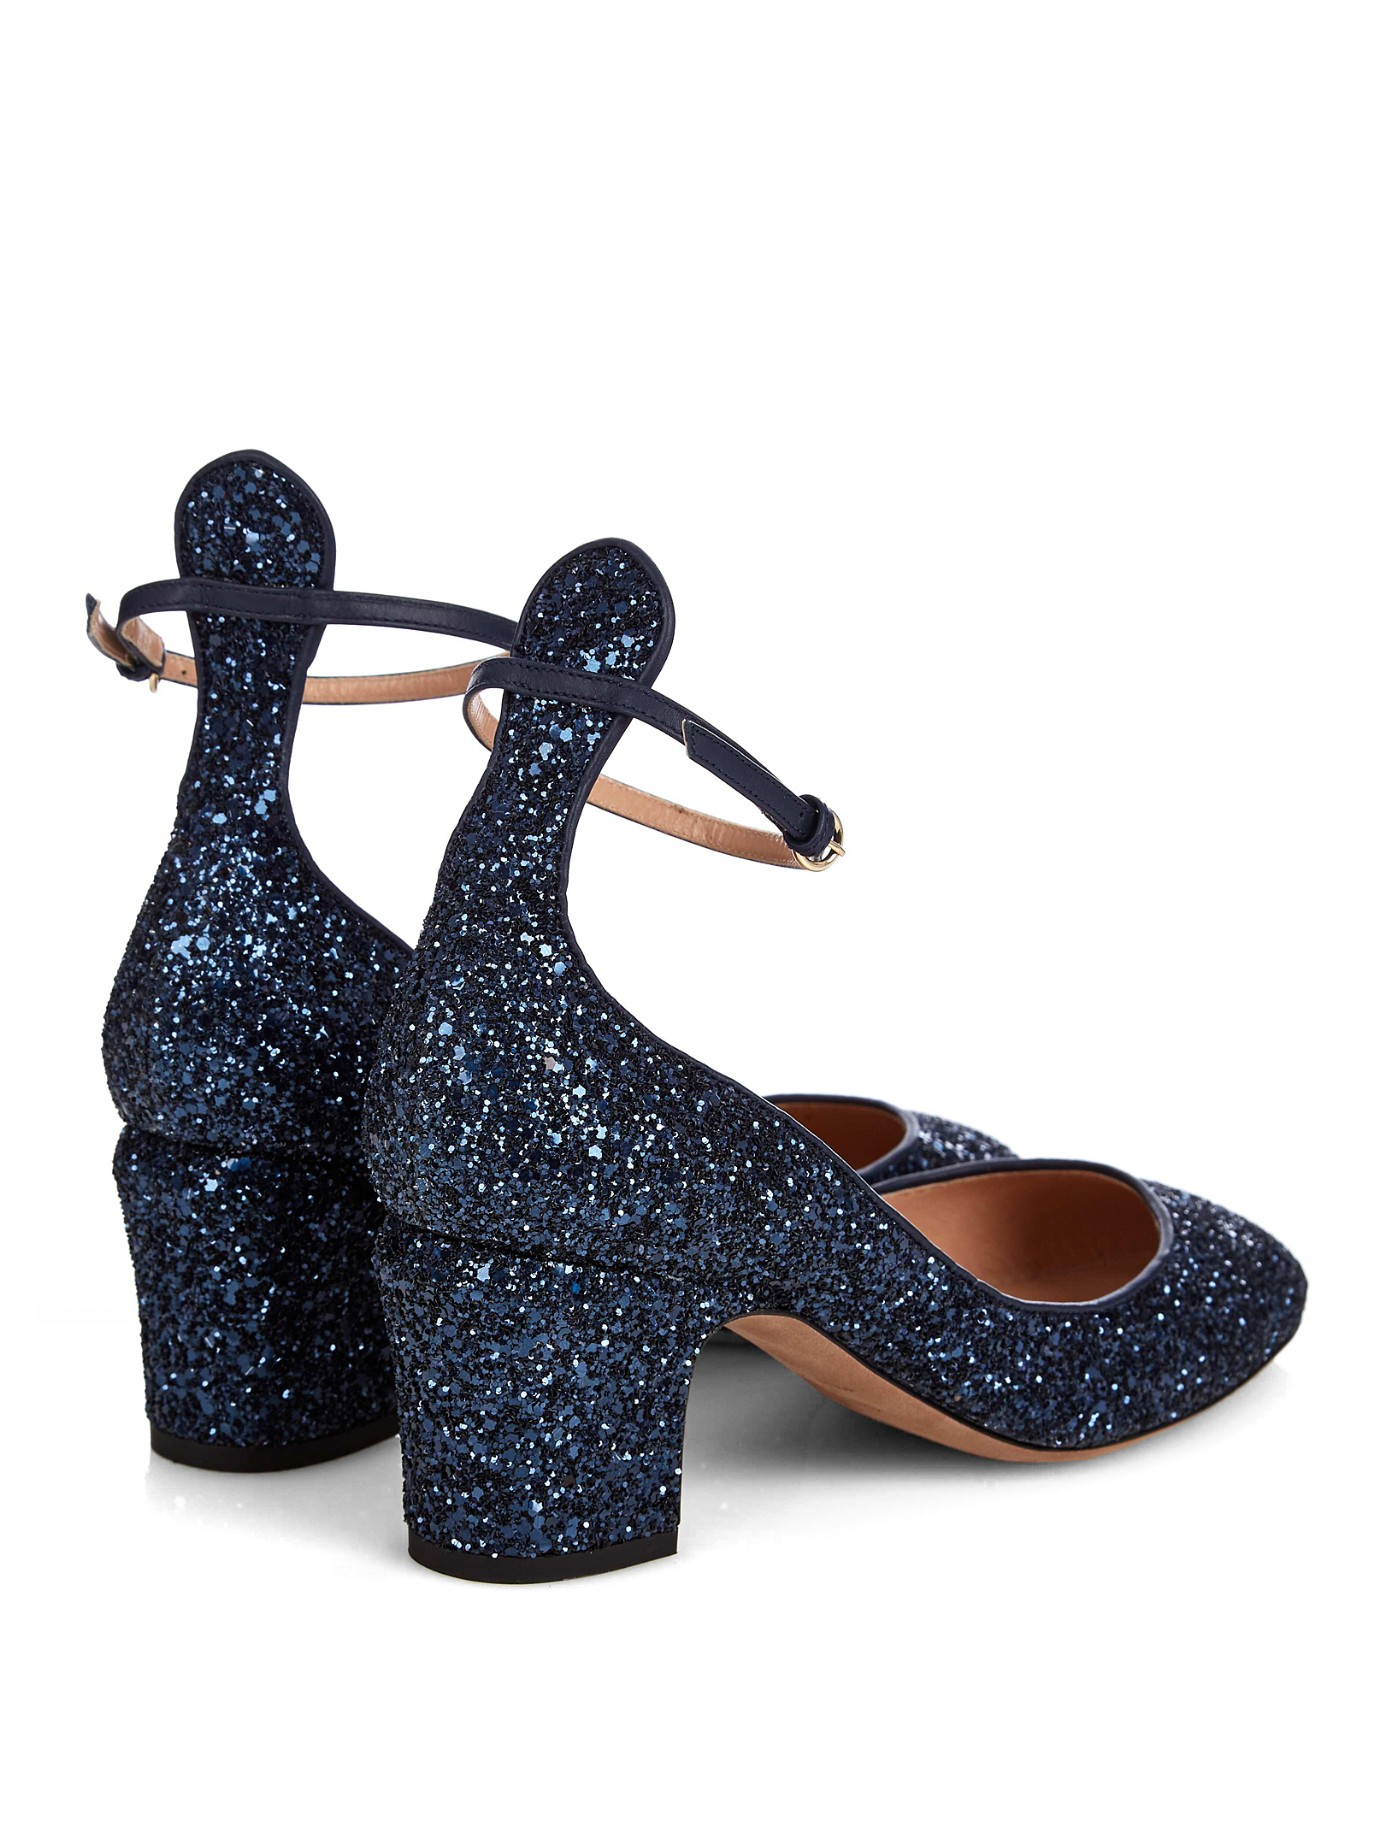 5c68b6cde162 Valentino Tango Glitter Pumps in Blue - Lyst